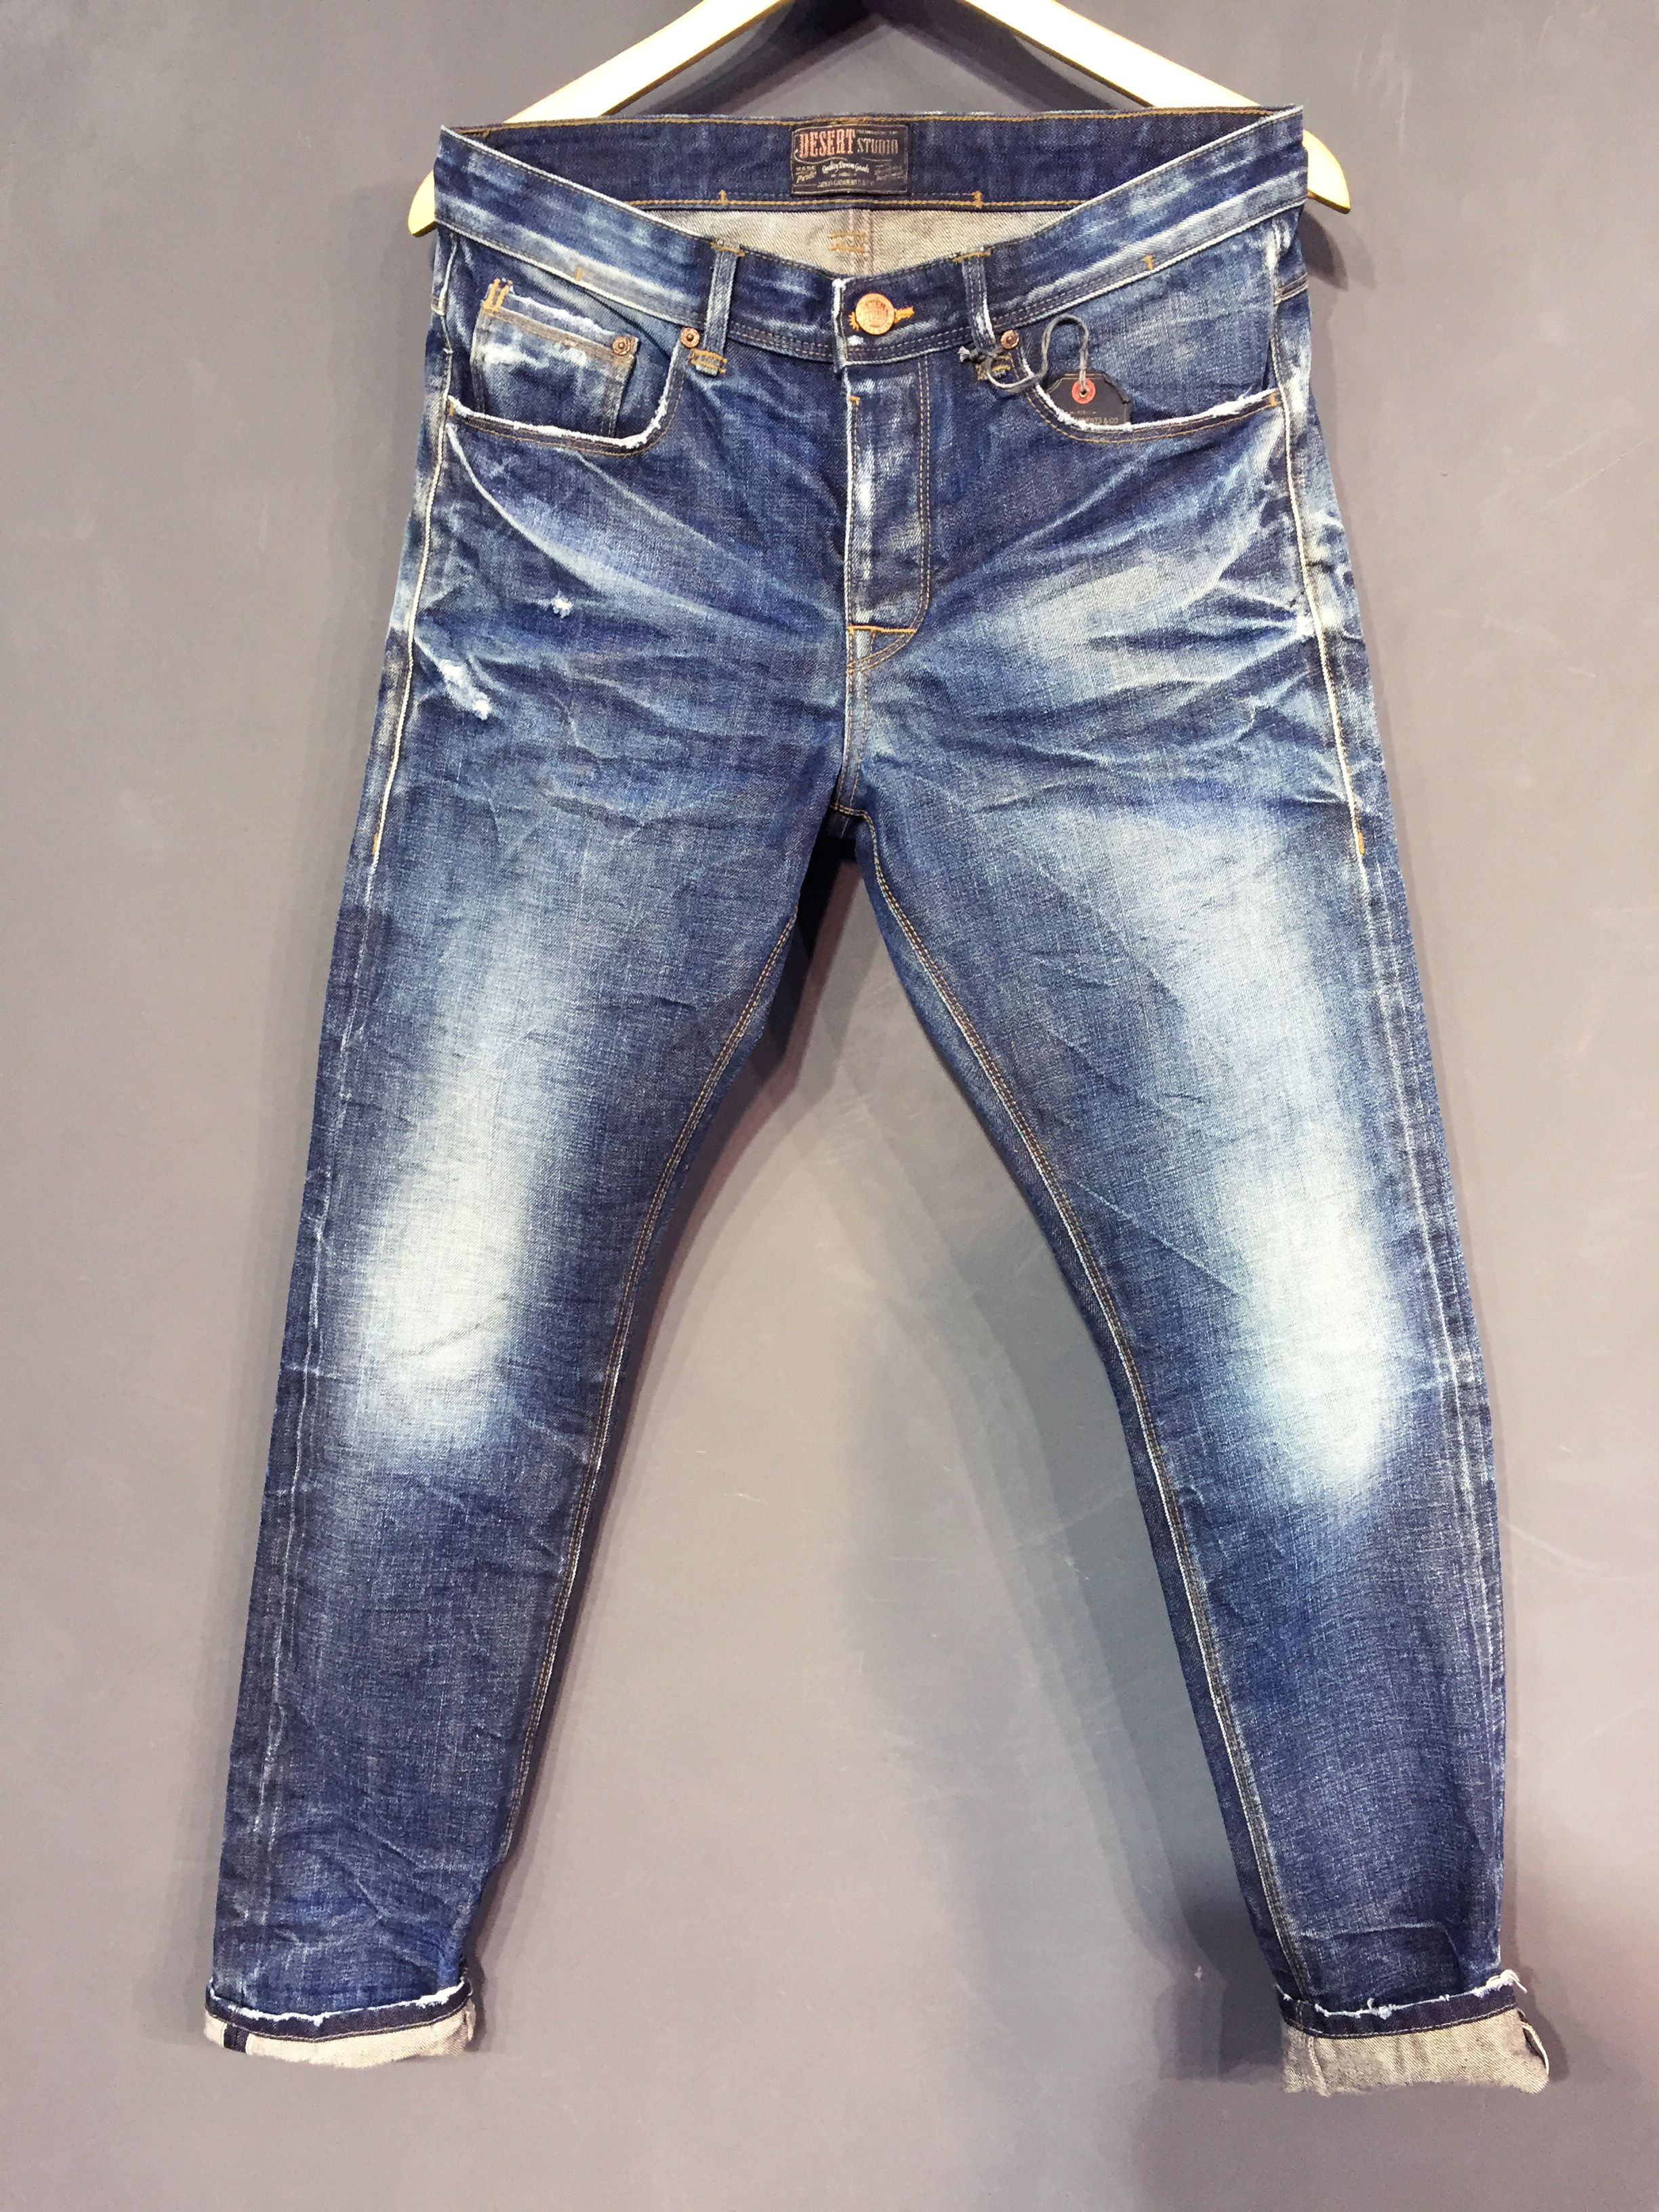 DENIM - Denim trousers Concept hcKyj